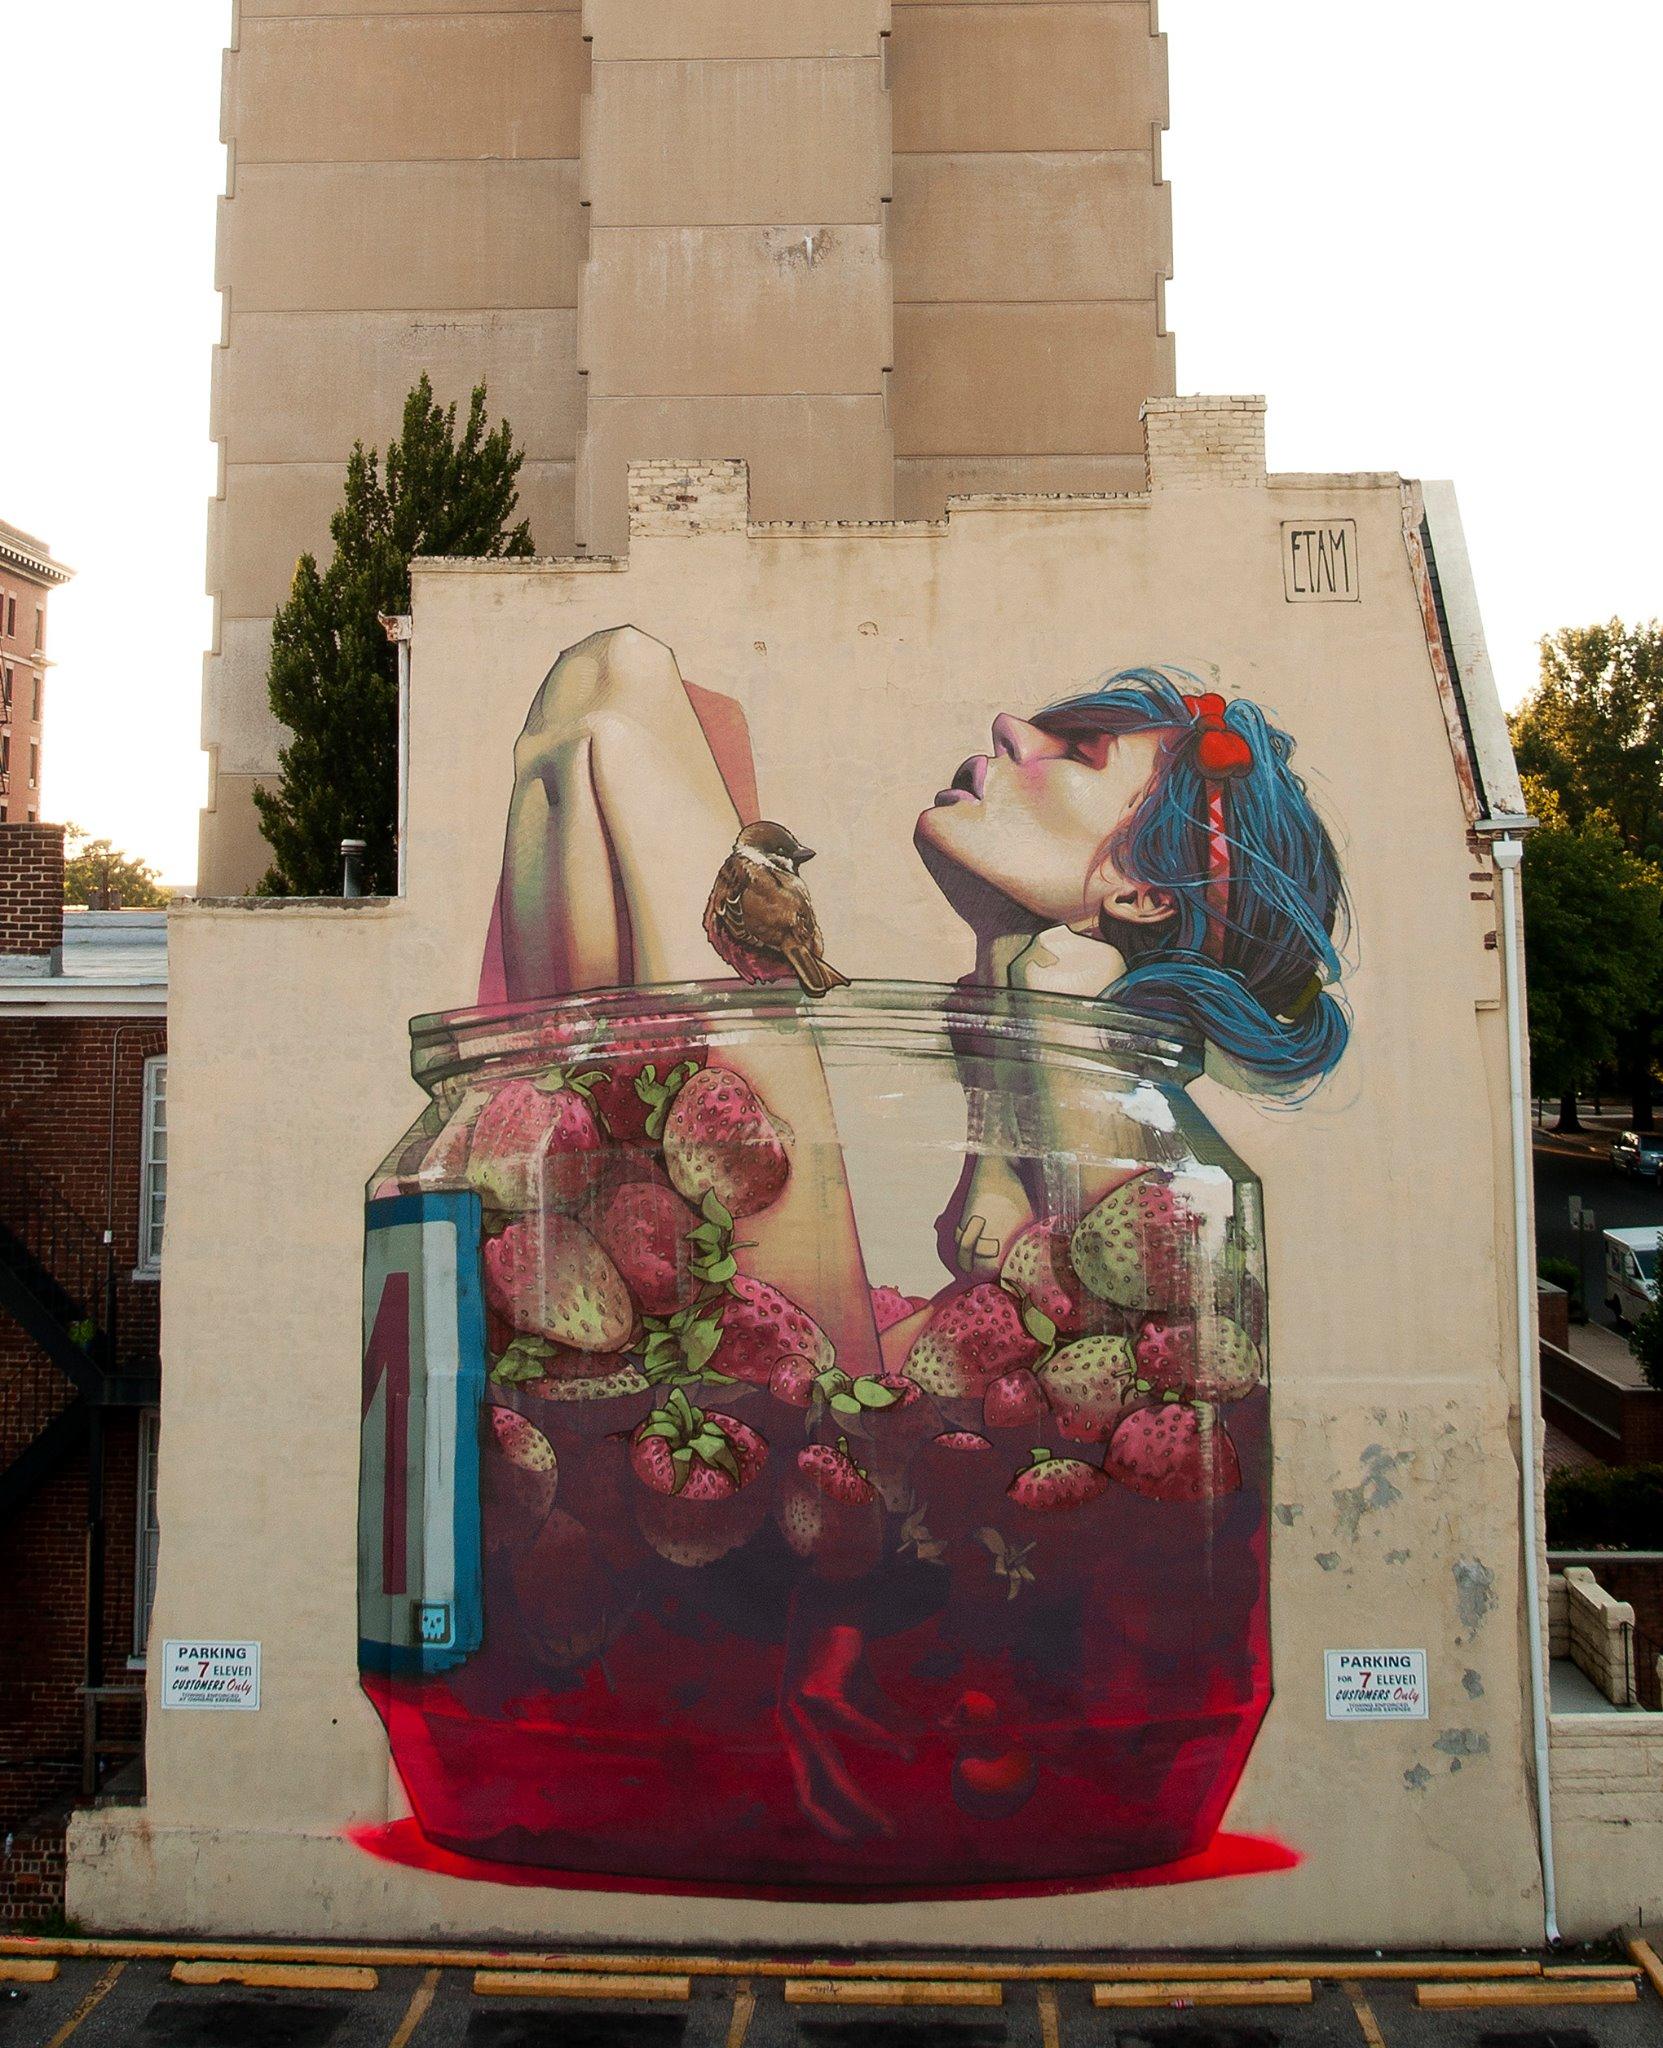 etam-cru-bezt-sainer-street-art-large-murals-05